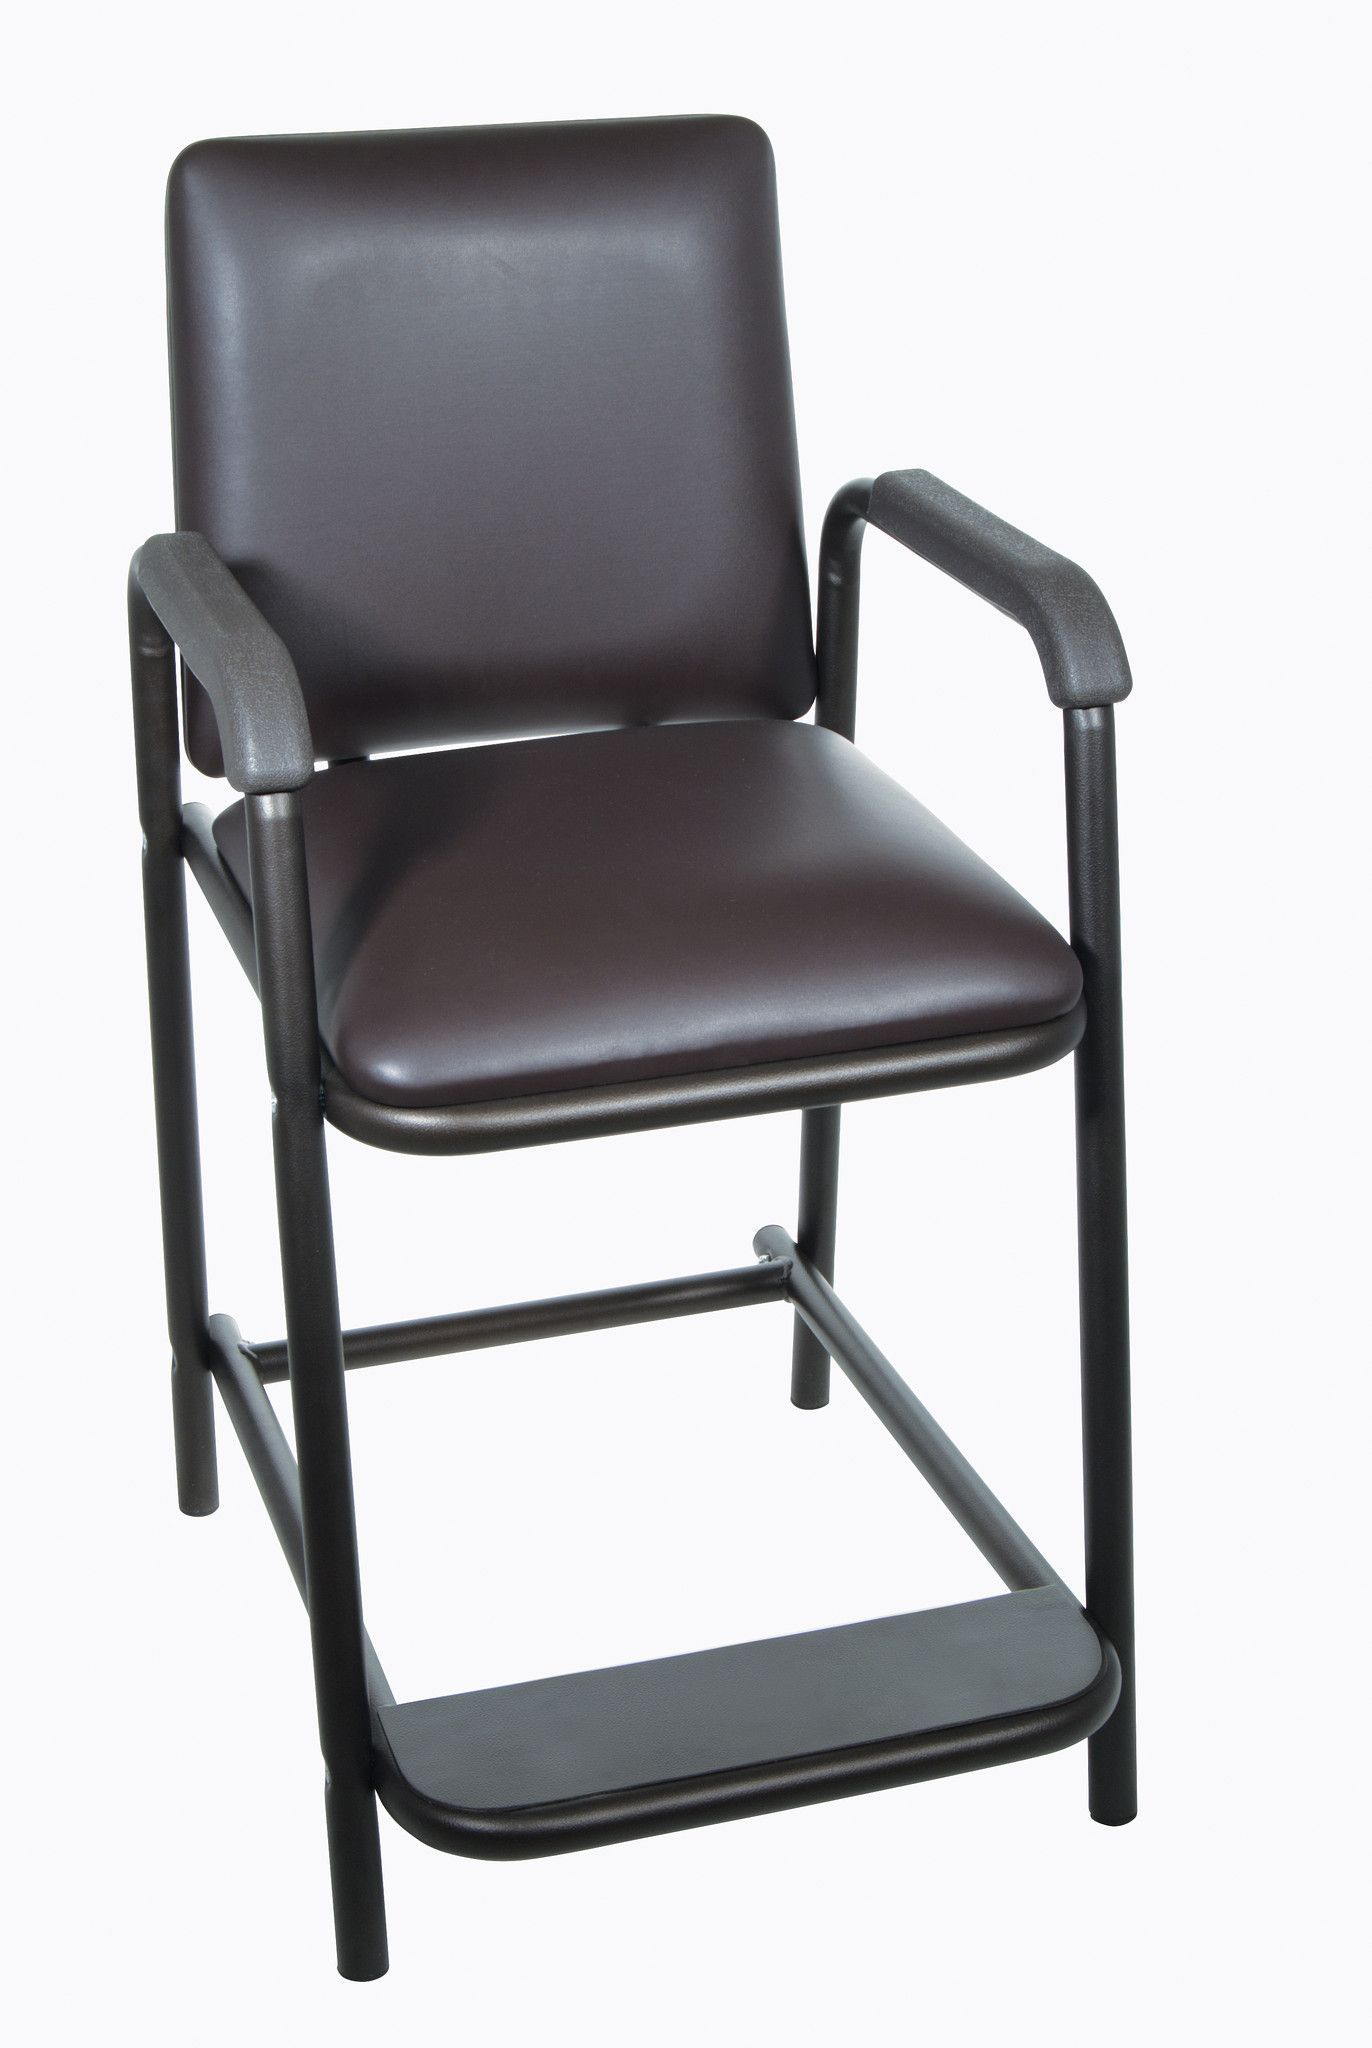 Hip High Chair with Padded Seat High chair, Chair, Chair